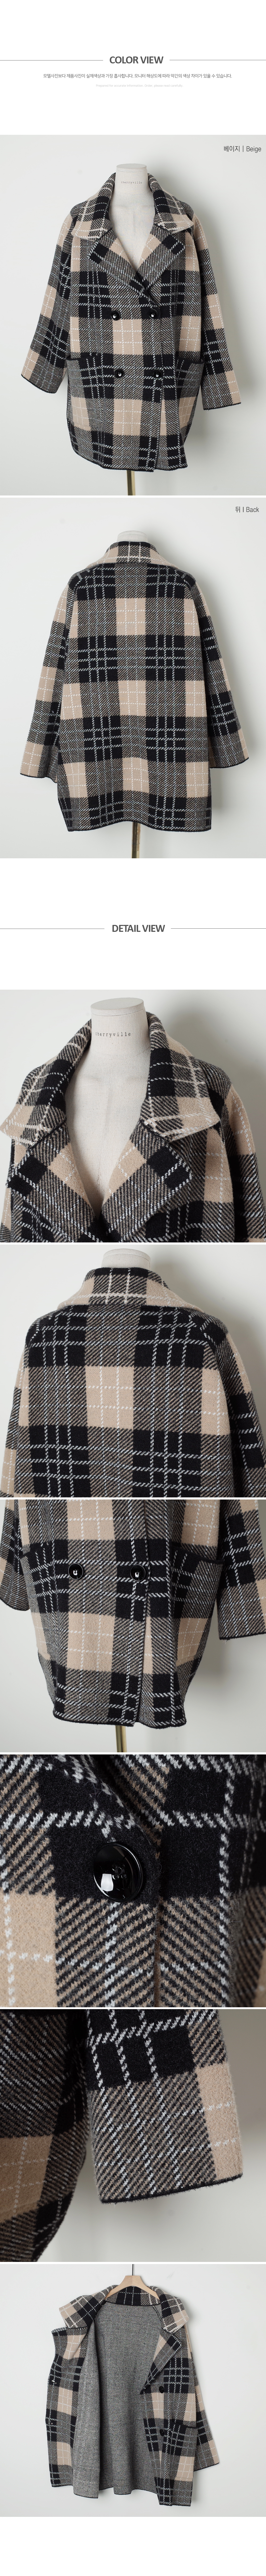 Check Charm Fondant Coat